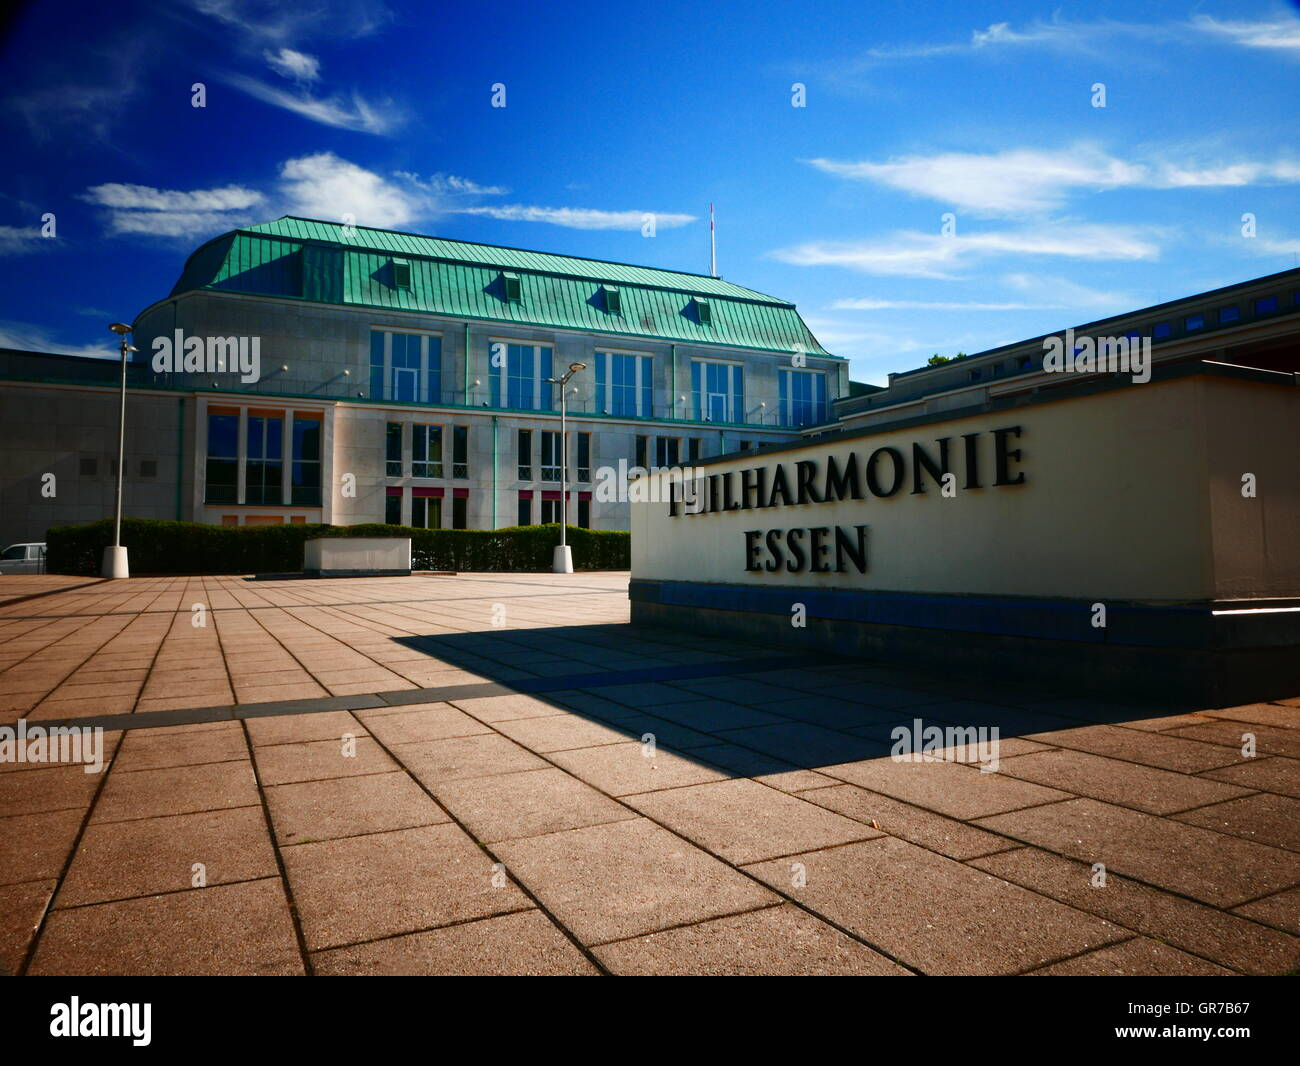 Phiharmonie Essen Nordrhein Westfalan Germany Europe - Stock Image